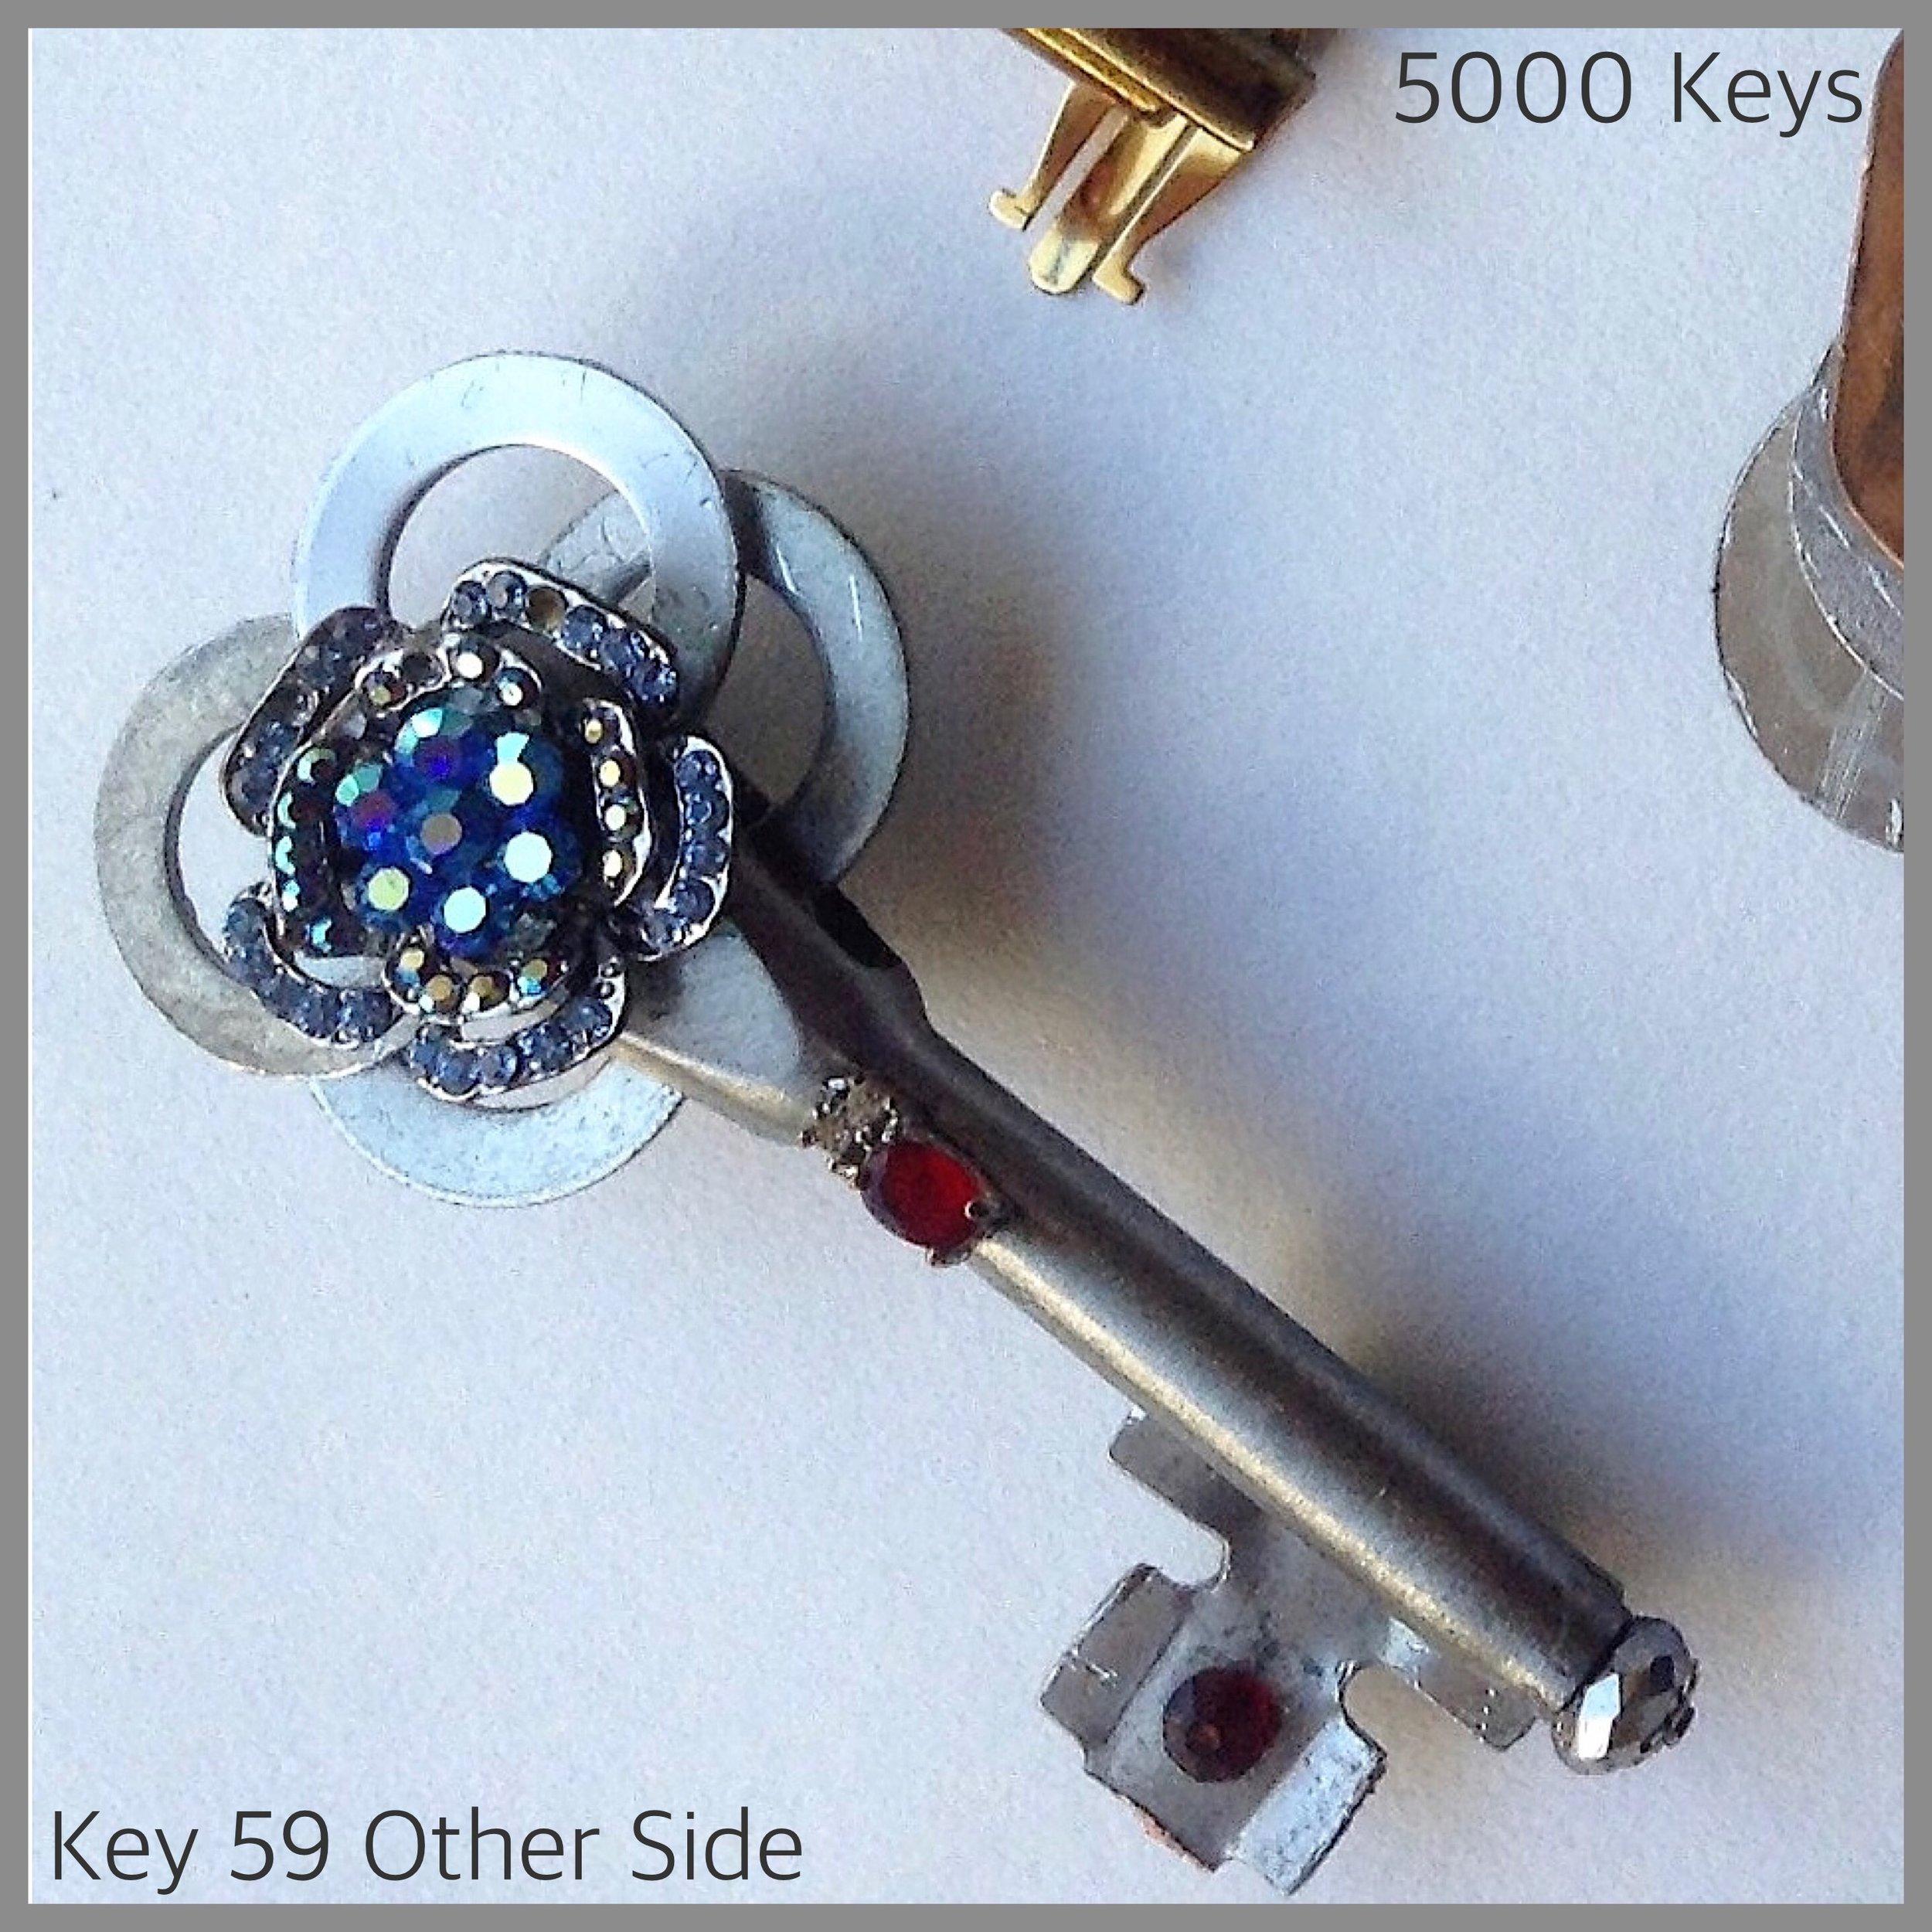 Key 59 Other side - 1.JPG